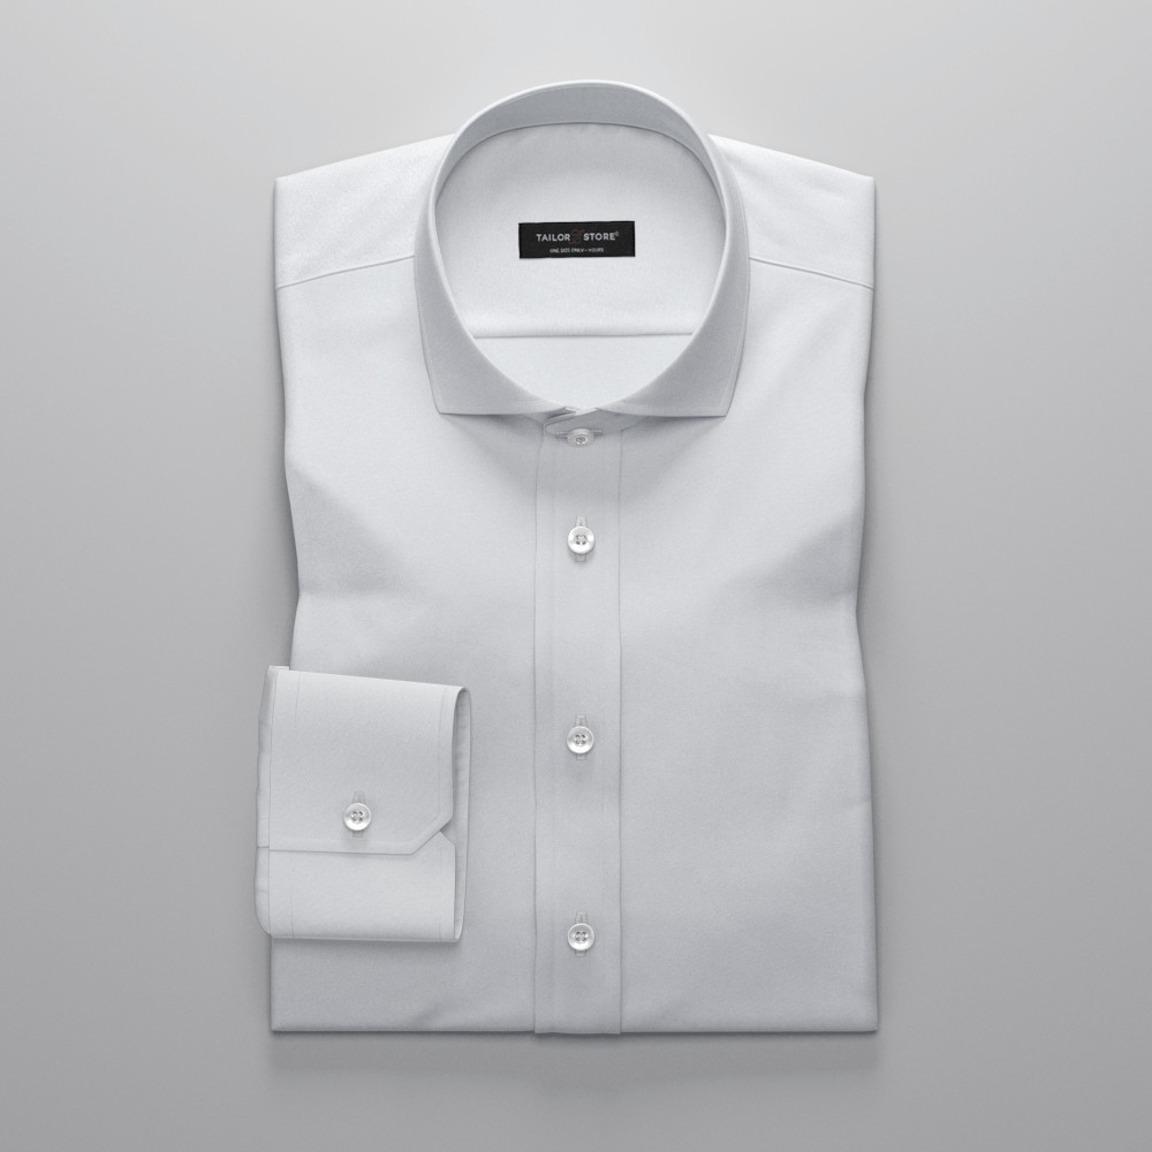 Vit Oxfordskjorta med cut-away collar